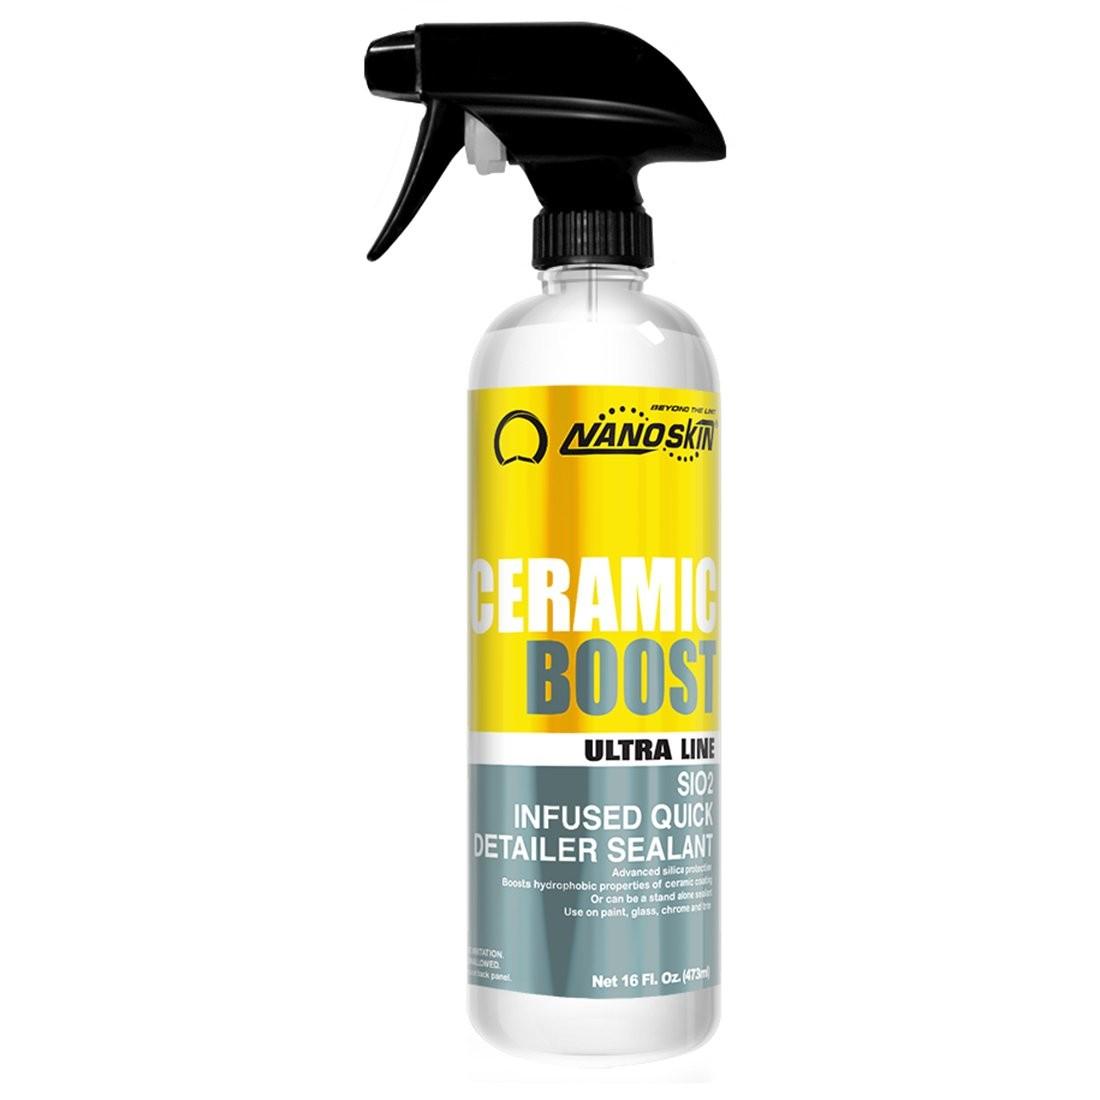 Ceramic Boost SiO2 Infused Quick Detailer Sealant -5Gal